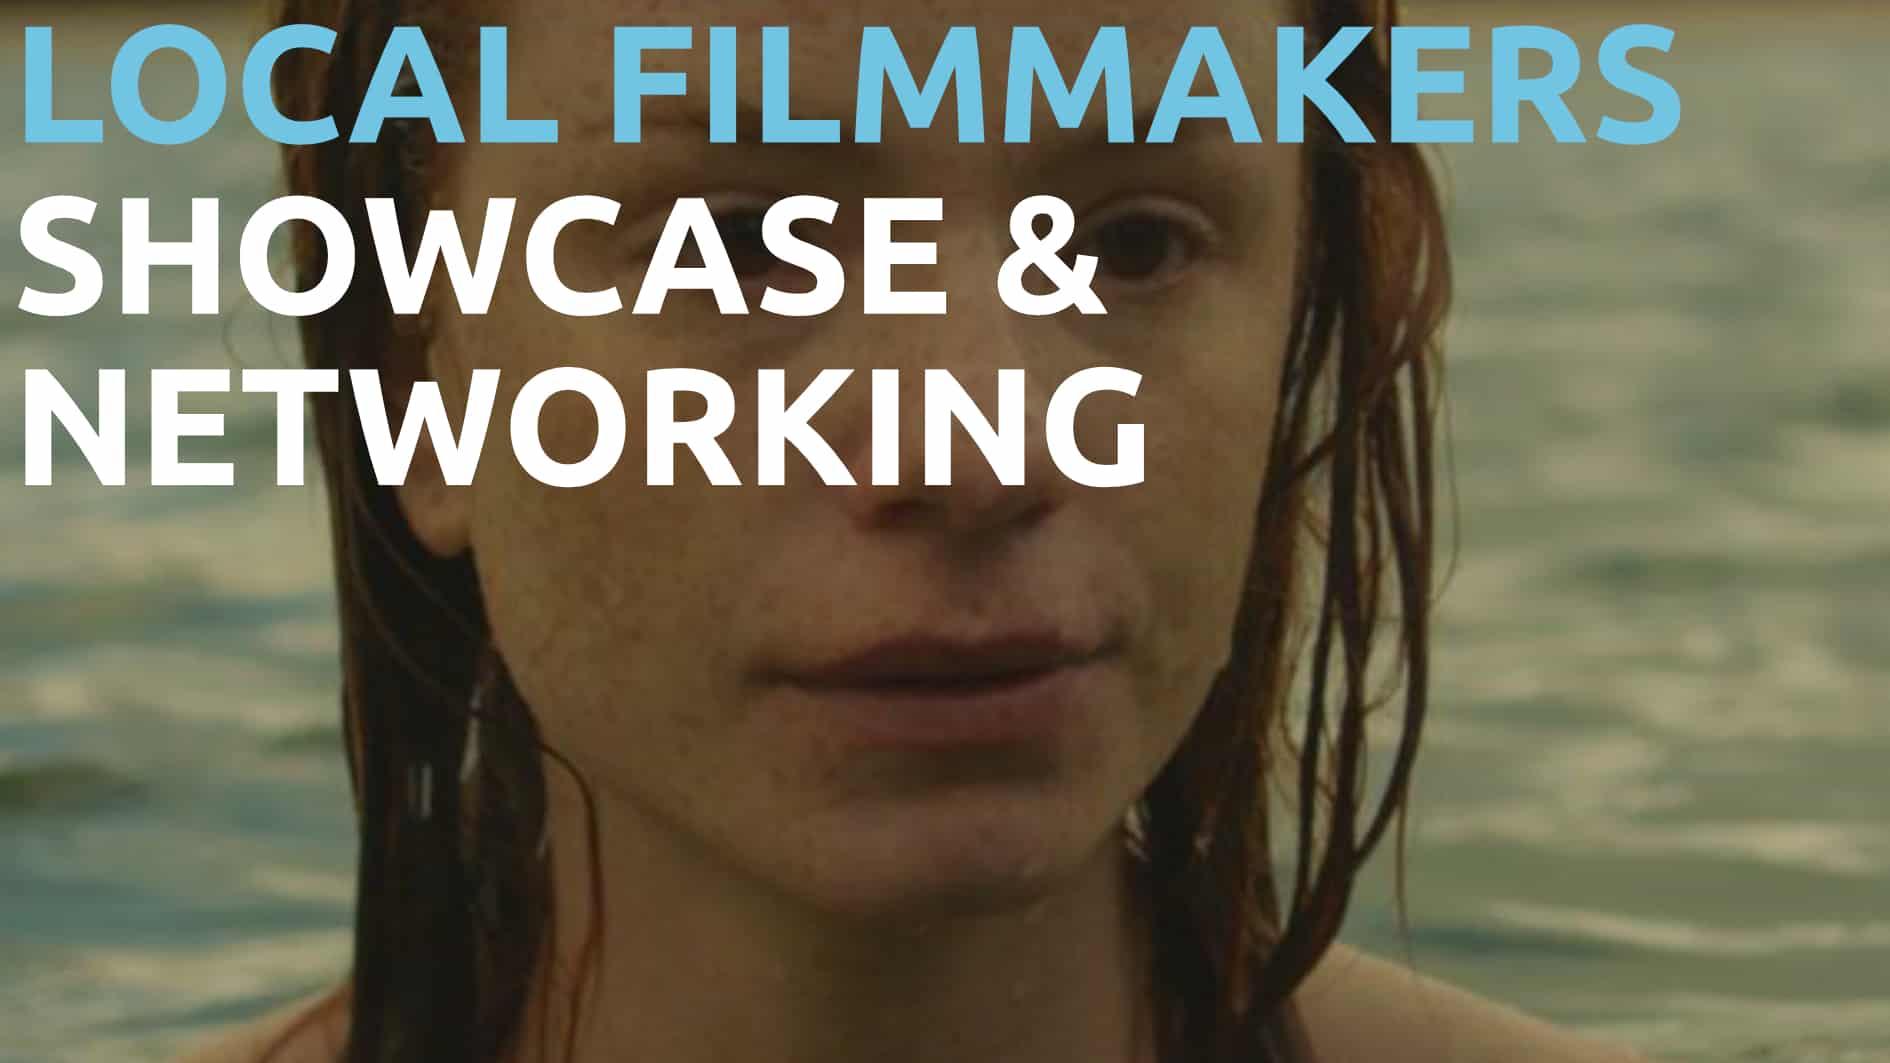 Amsterdam Lift-Off Film Festival 2018 - Local Filmmakers Showcase